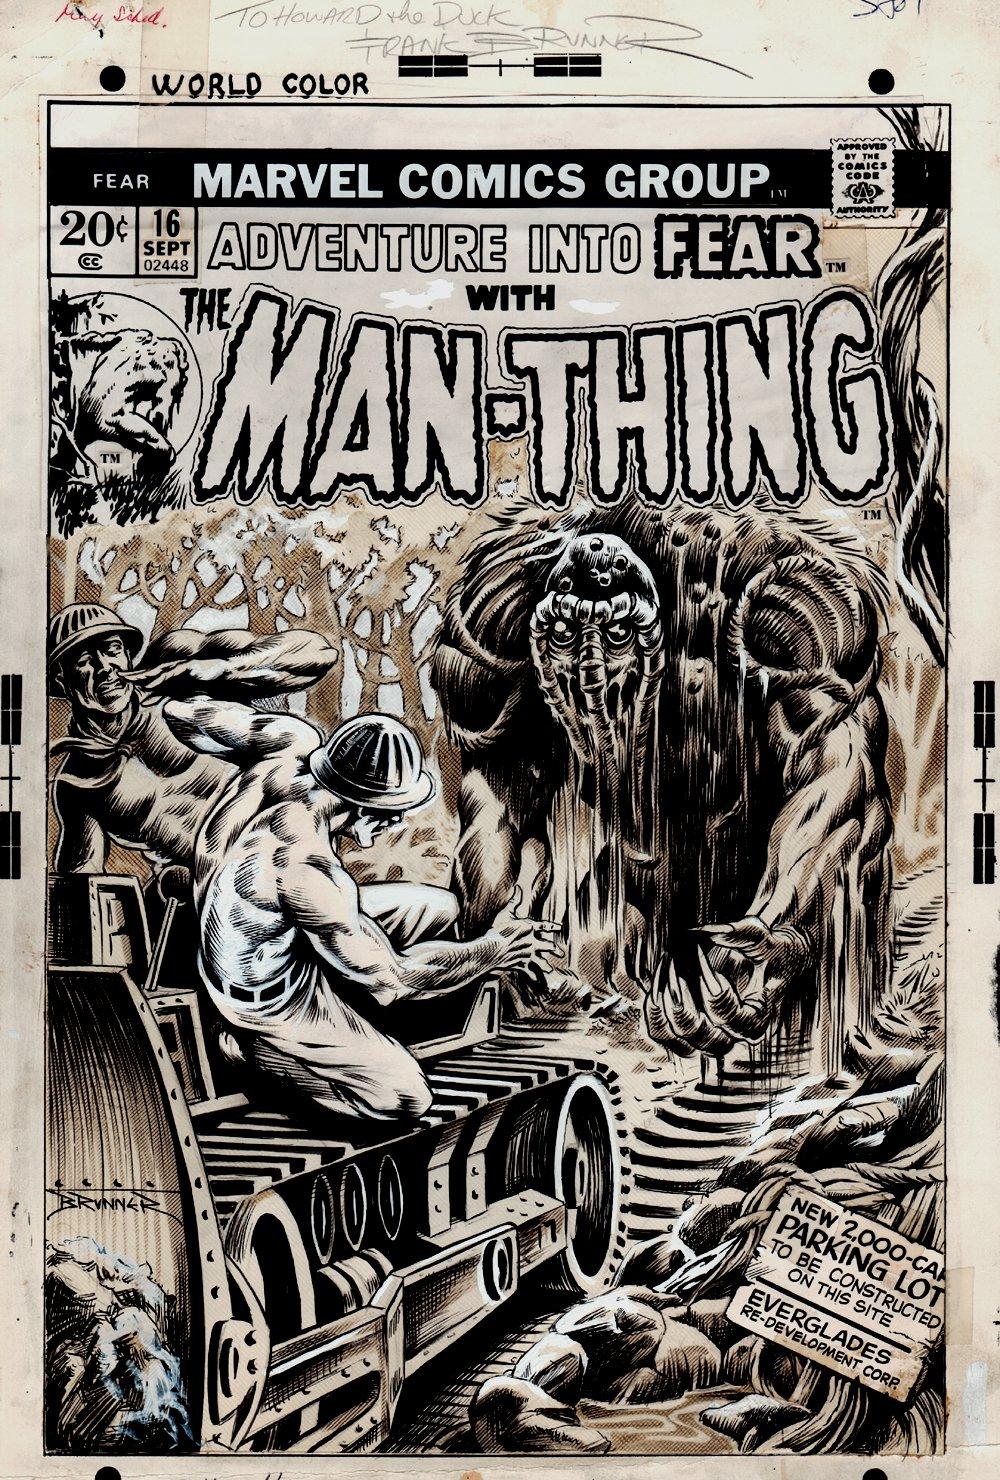 Adventure Into Fear #16 Cover (1973)